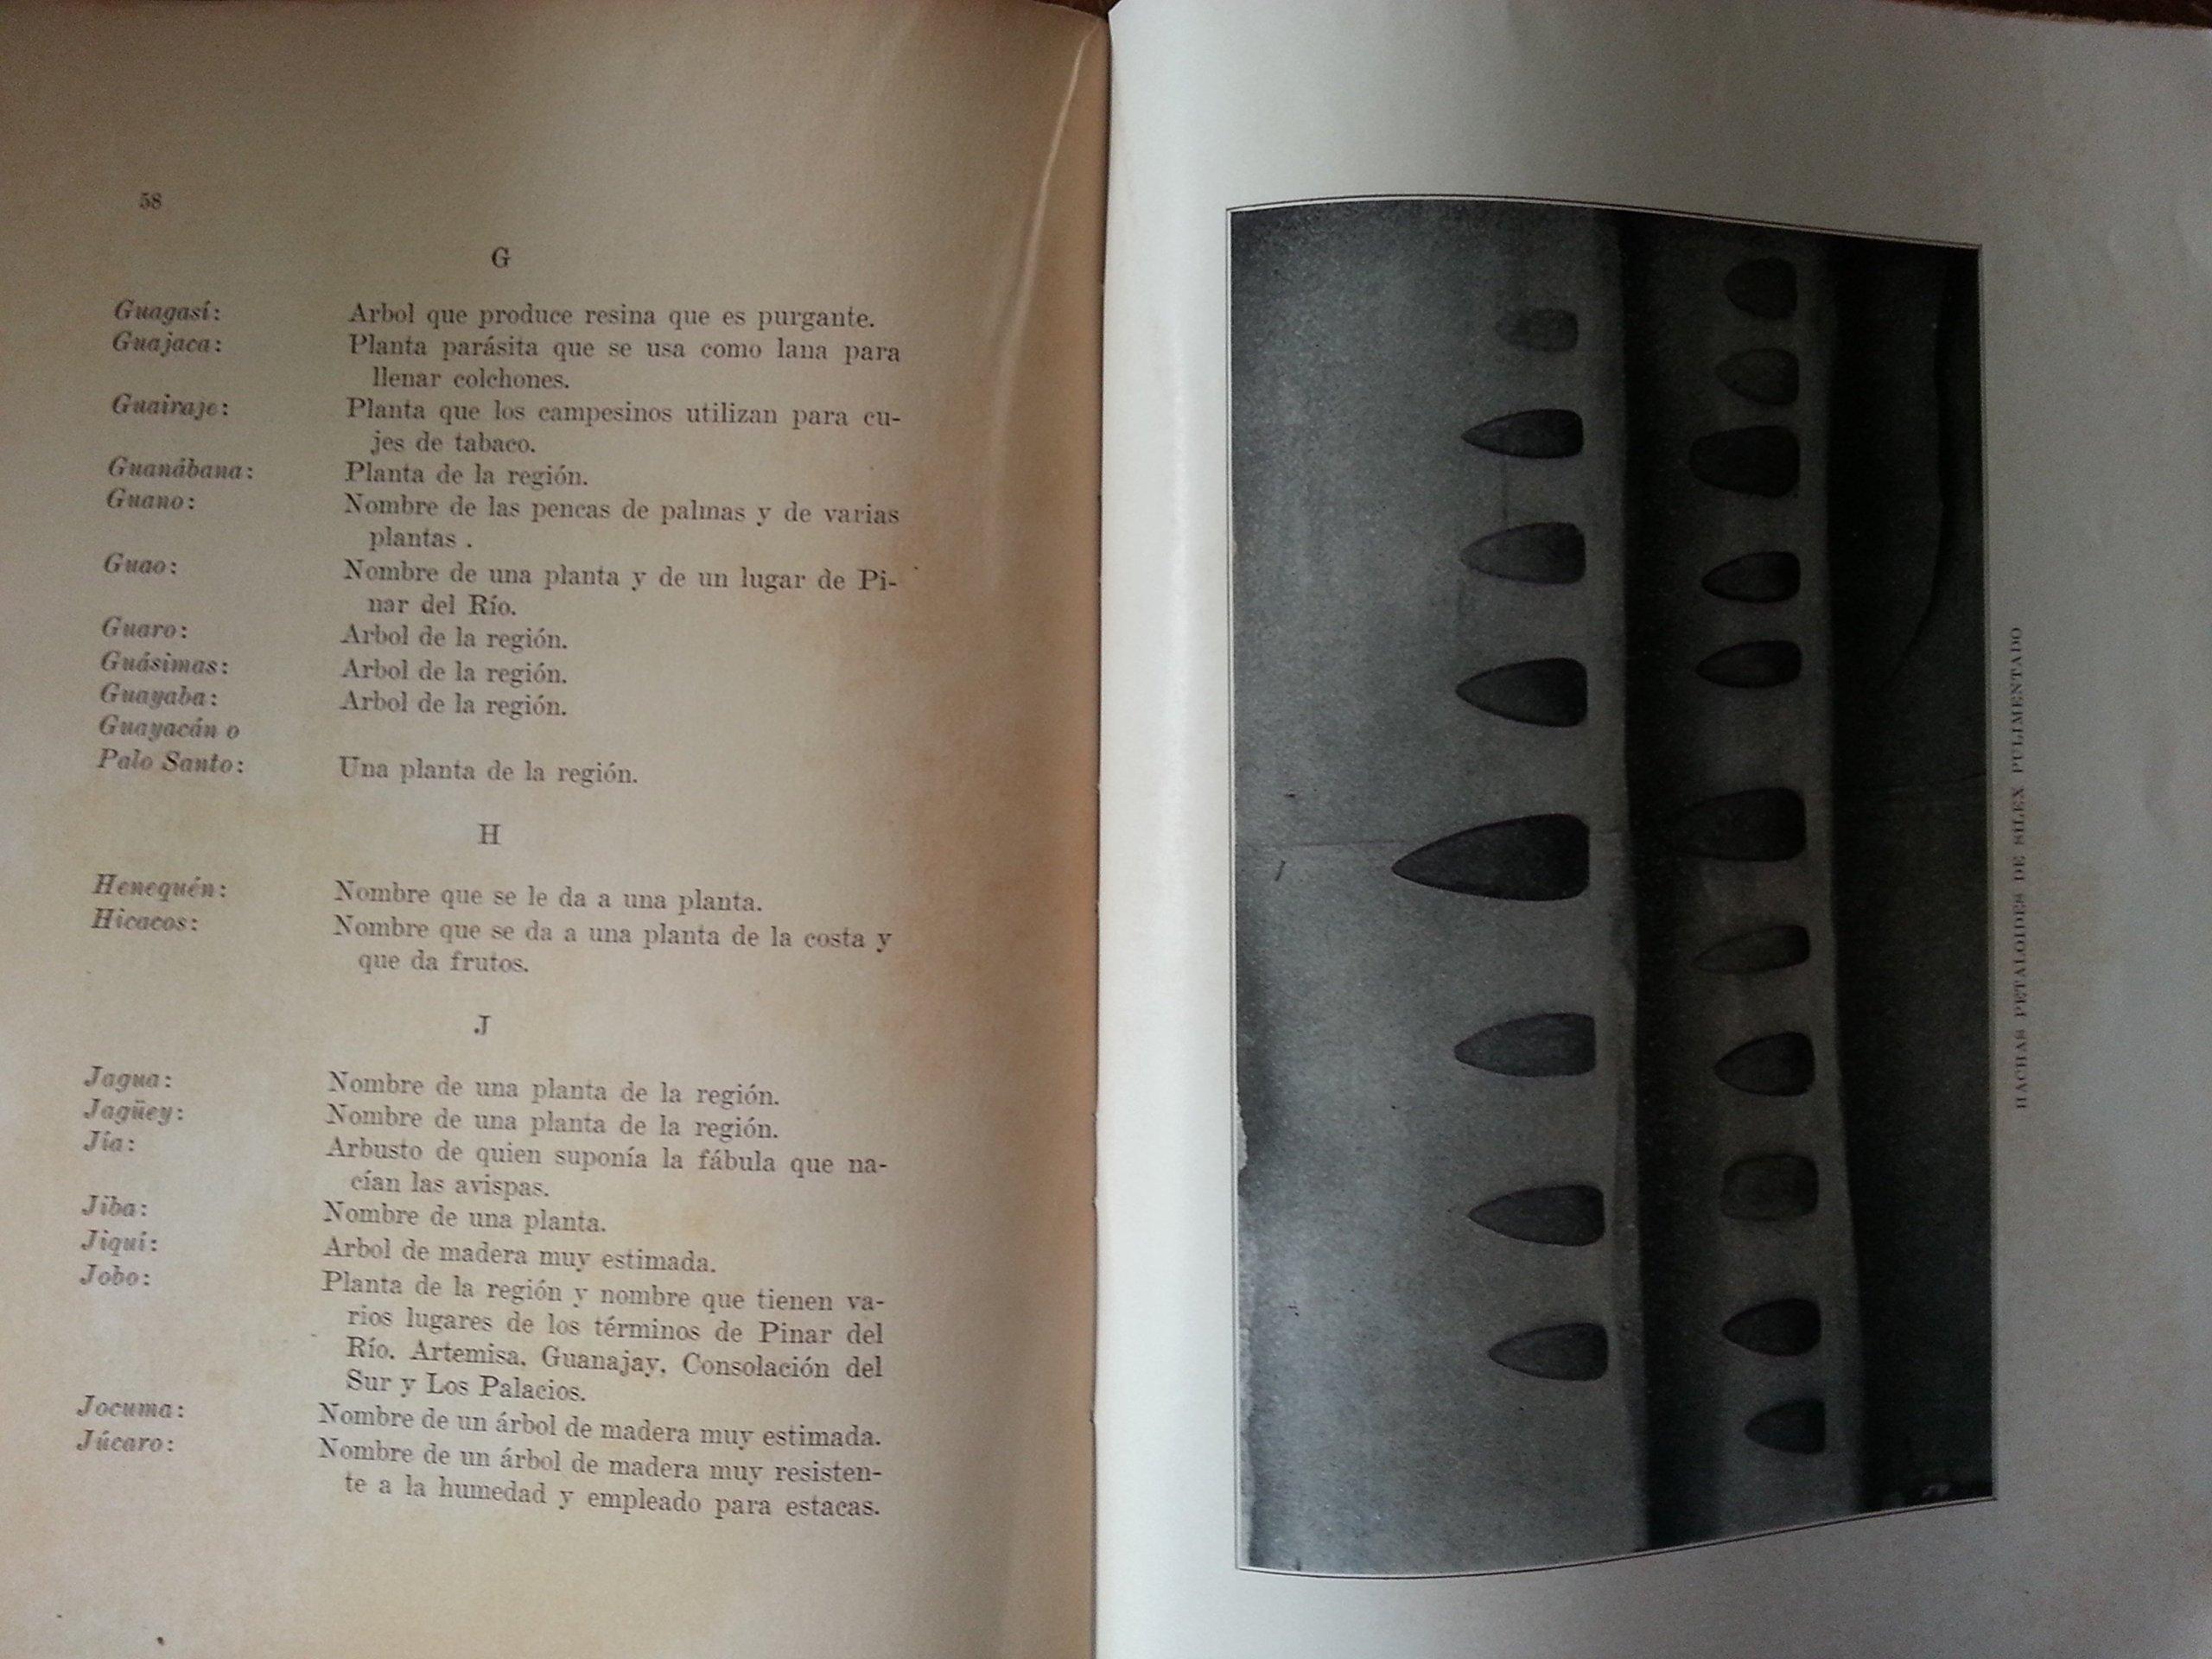 La civilizacion taina en pinar del rio.primera edicion, 1930.: pedro garcia valdes: Amazon.com: Books